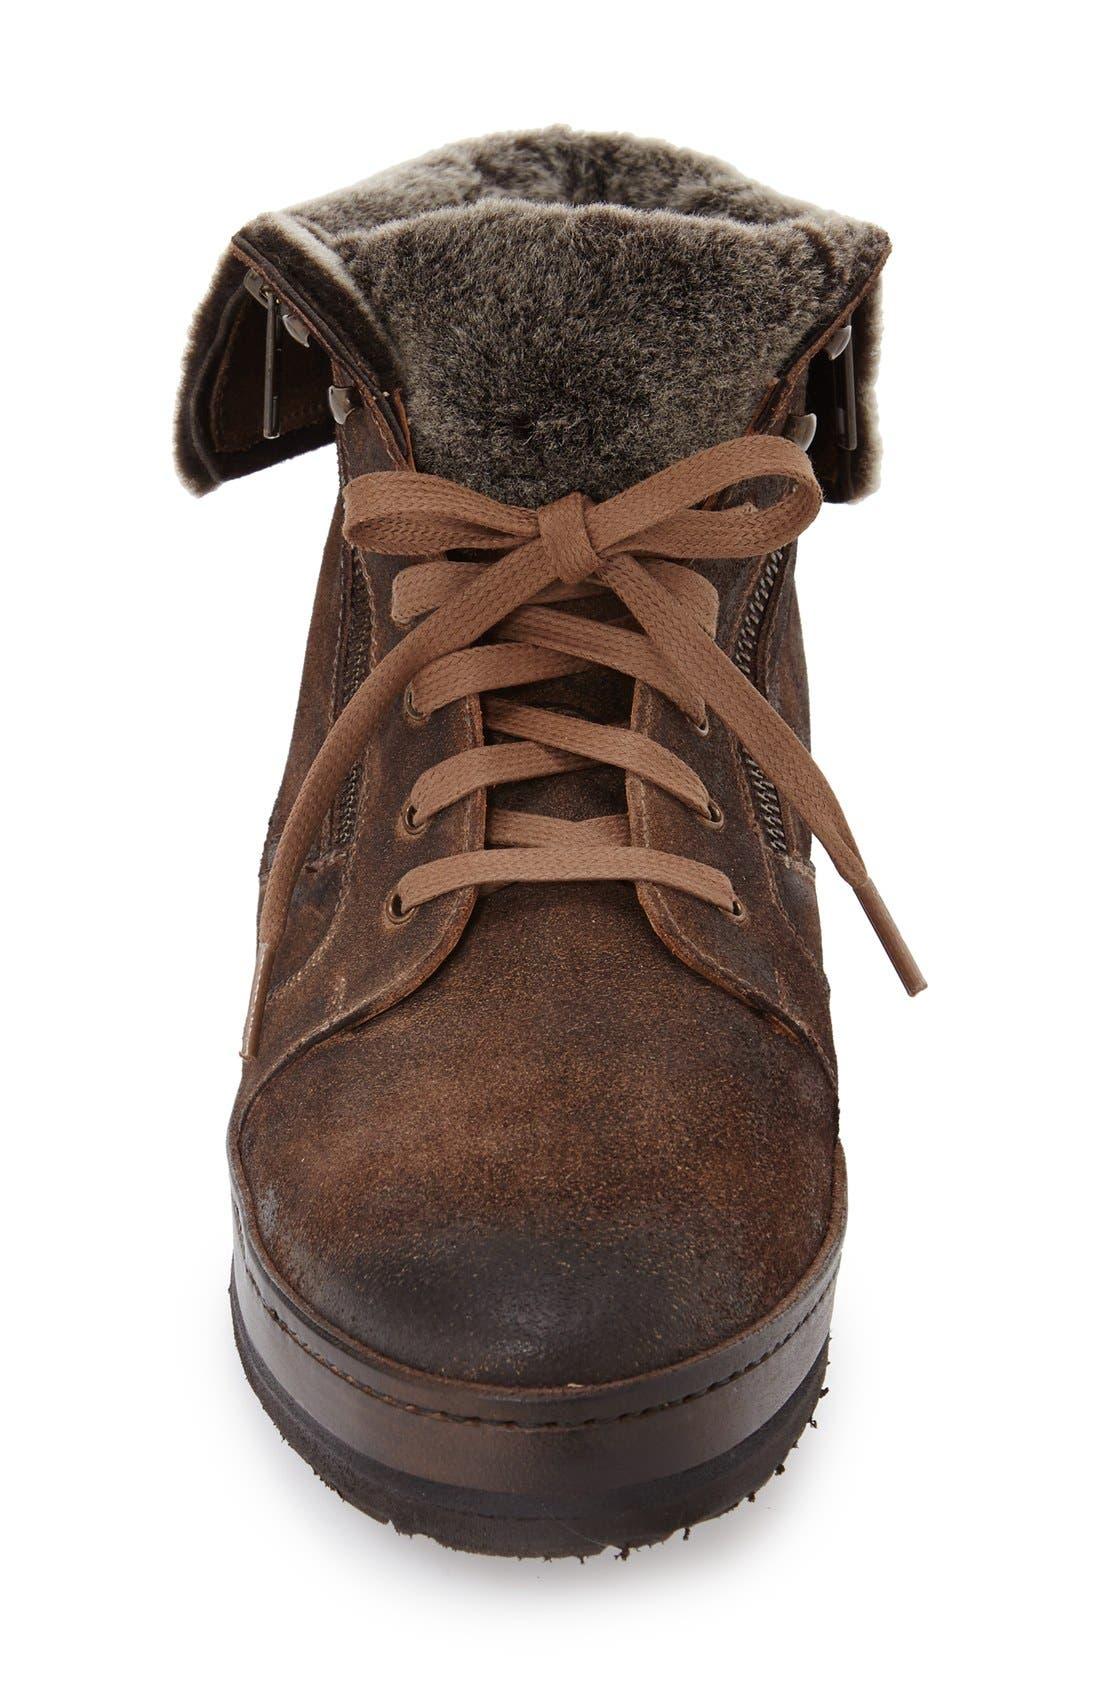 'Utrech' Sneaker Boot,                             Alternate thumbnail 3, color,                             Taupe